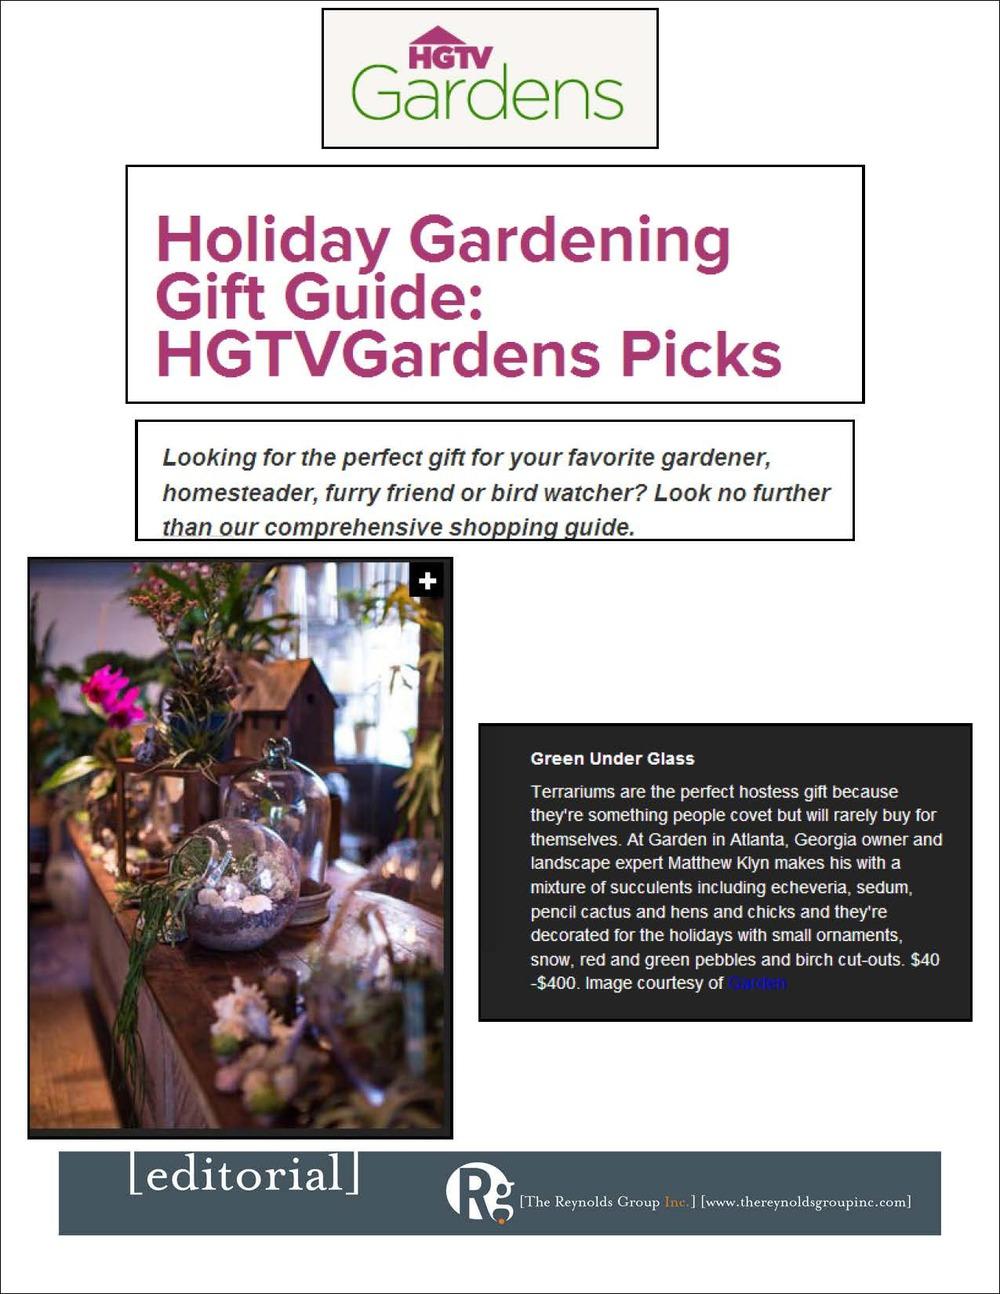 1212-12.11.12.Garden.HGTVGardens.jpg